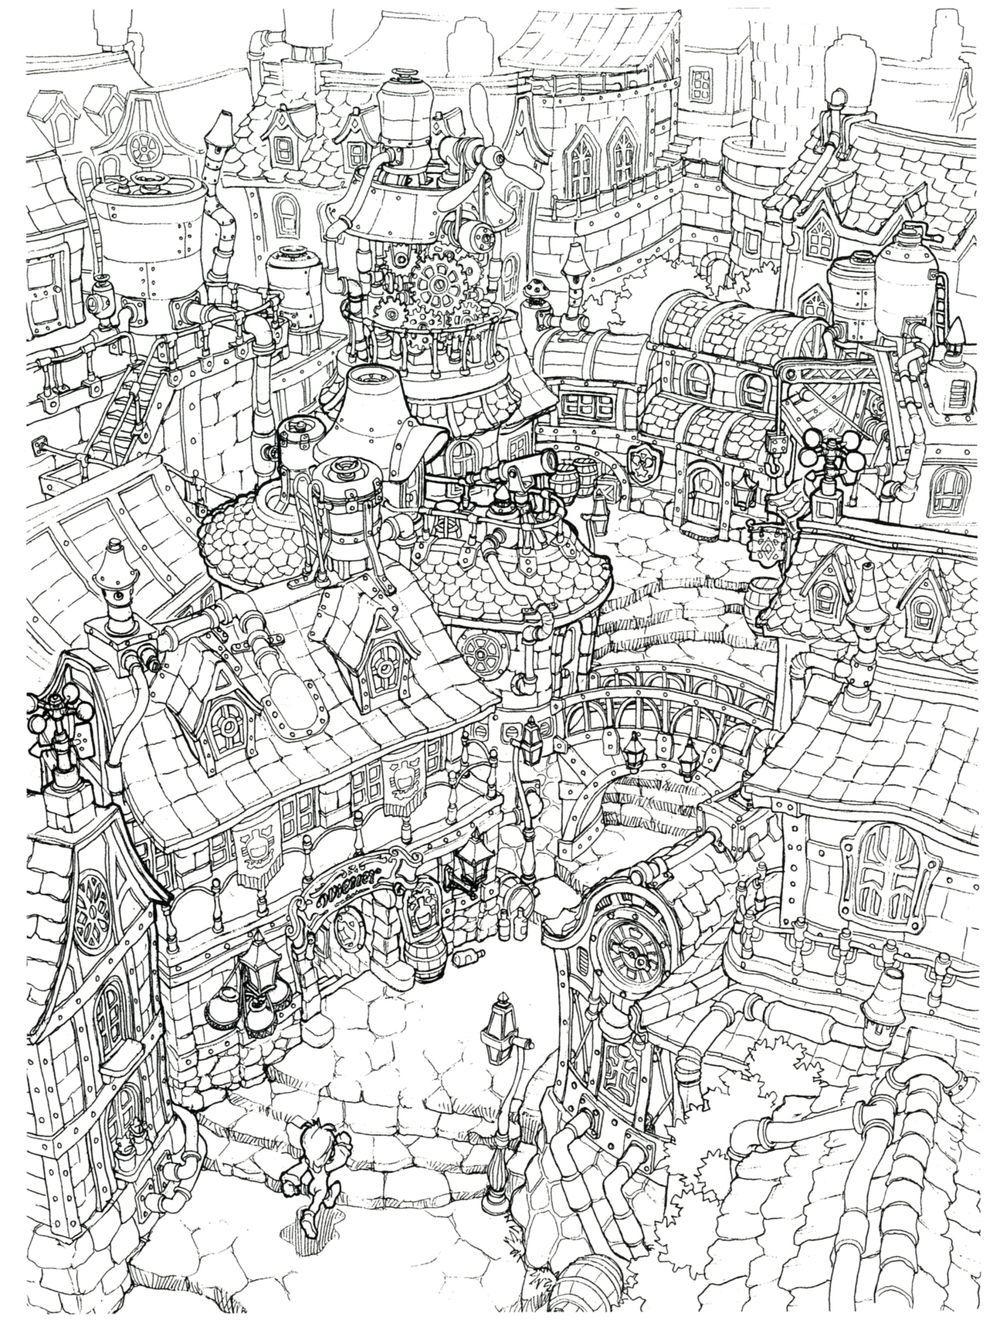 Kusanagi Studio Final Fantasy IX Artwork Images - The Final Fantasy ...